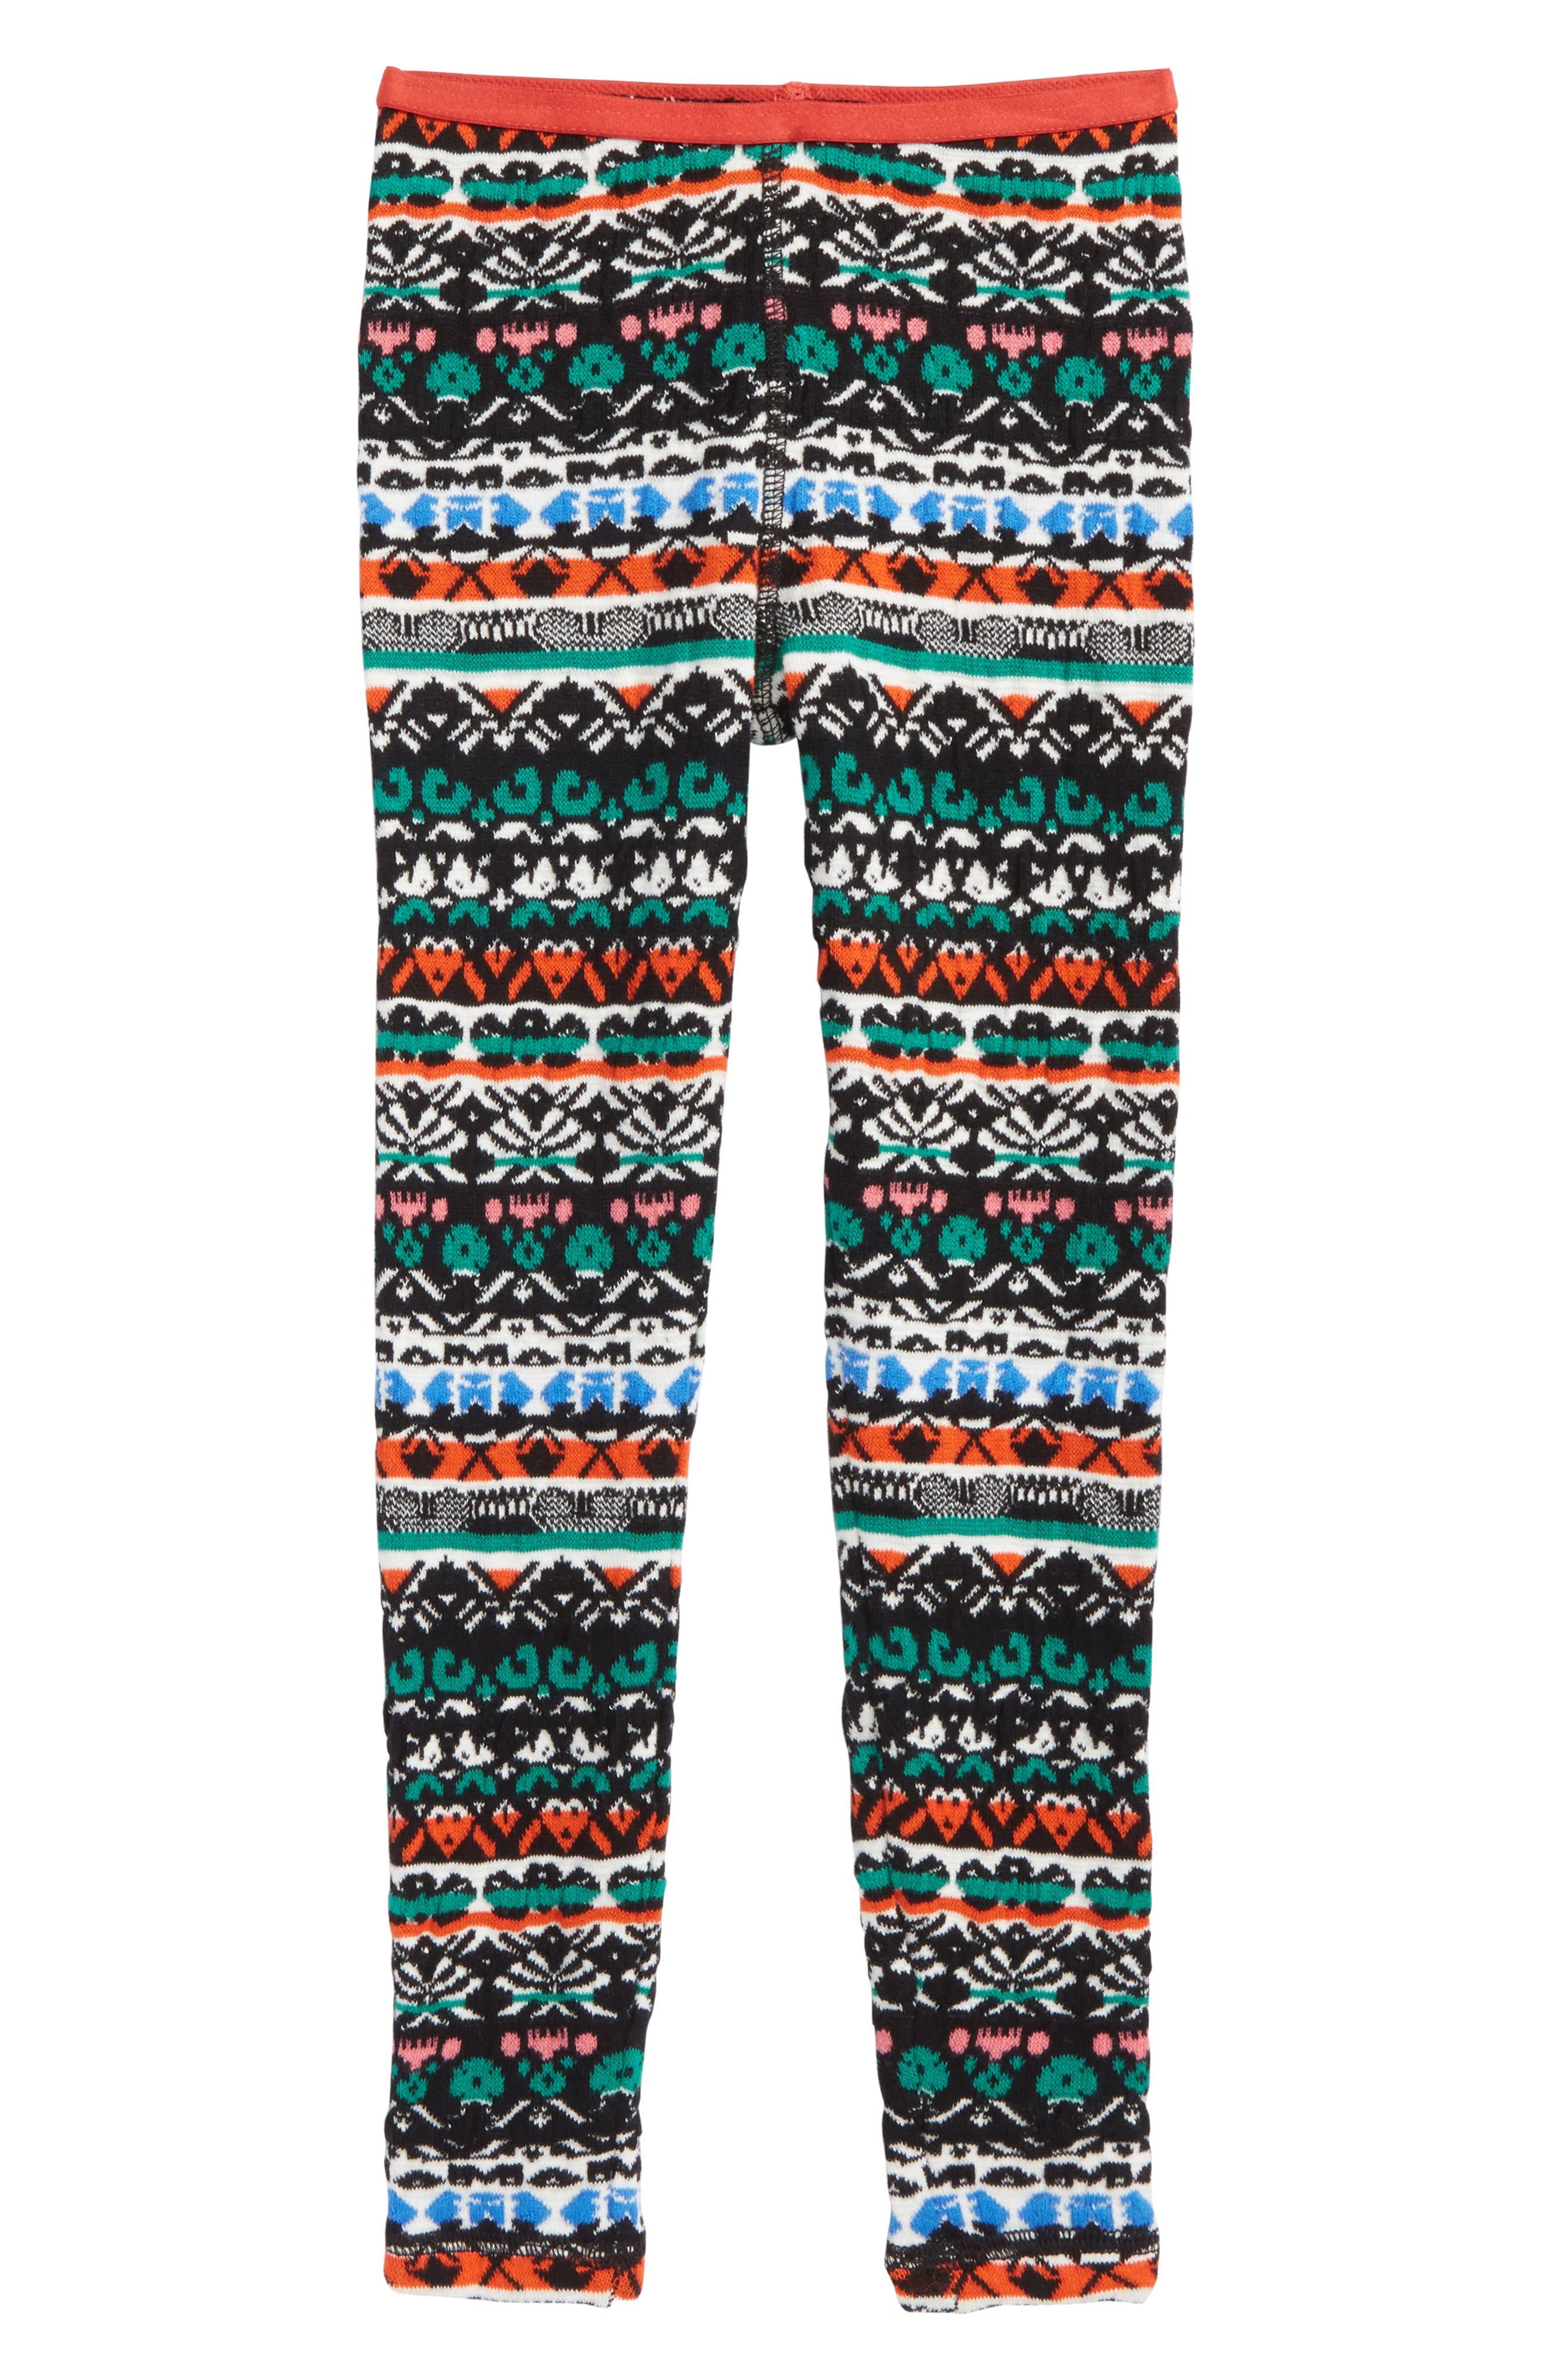 Alternate Image 1 Selected - Tucker + Tate Pattern Knit Leggings (Toddler Girls, Little Girls & Big Girls)